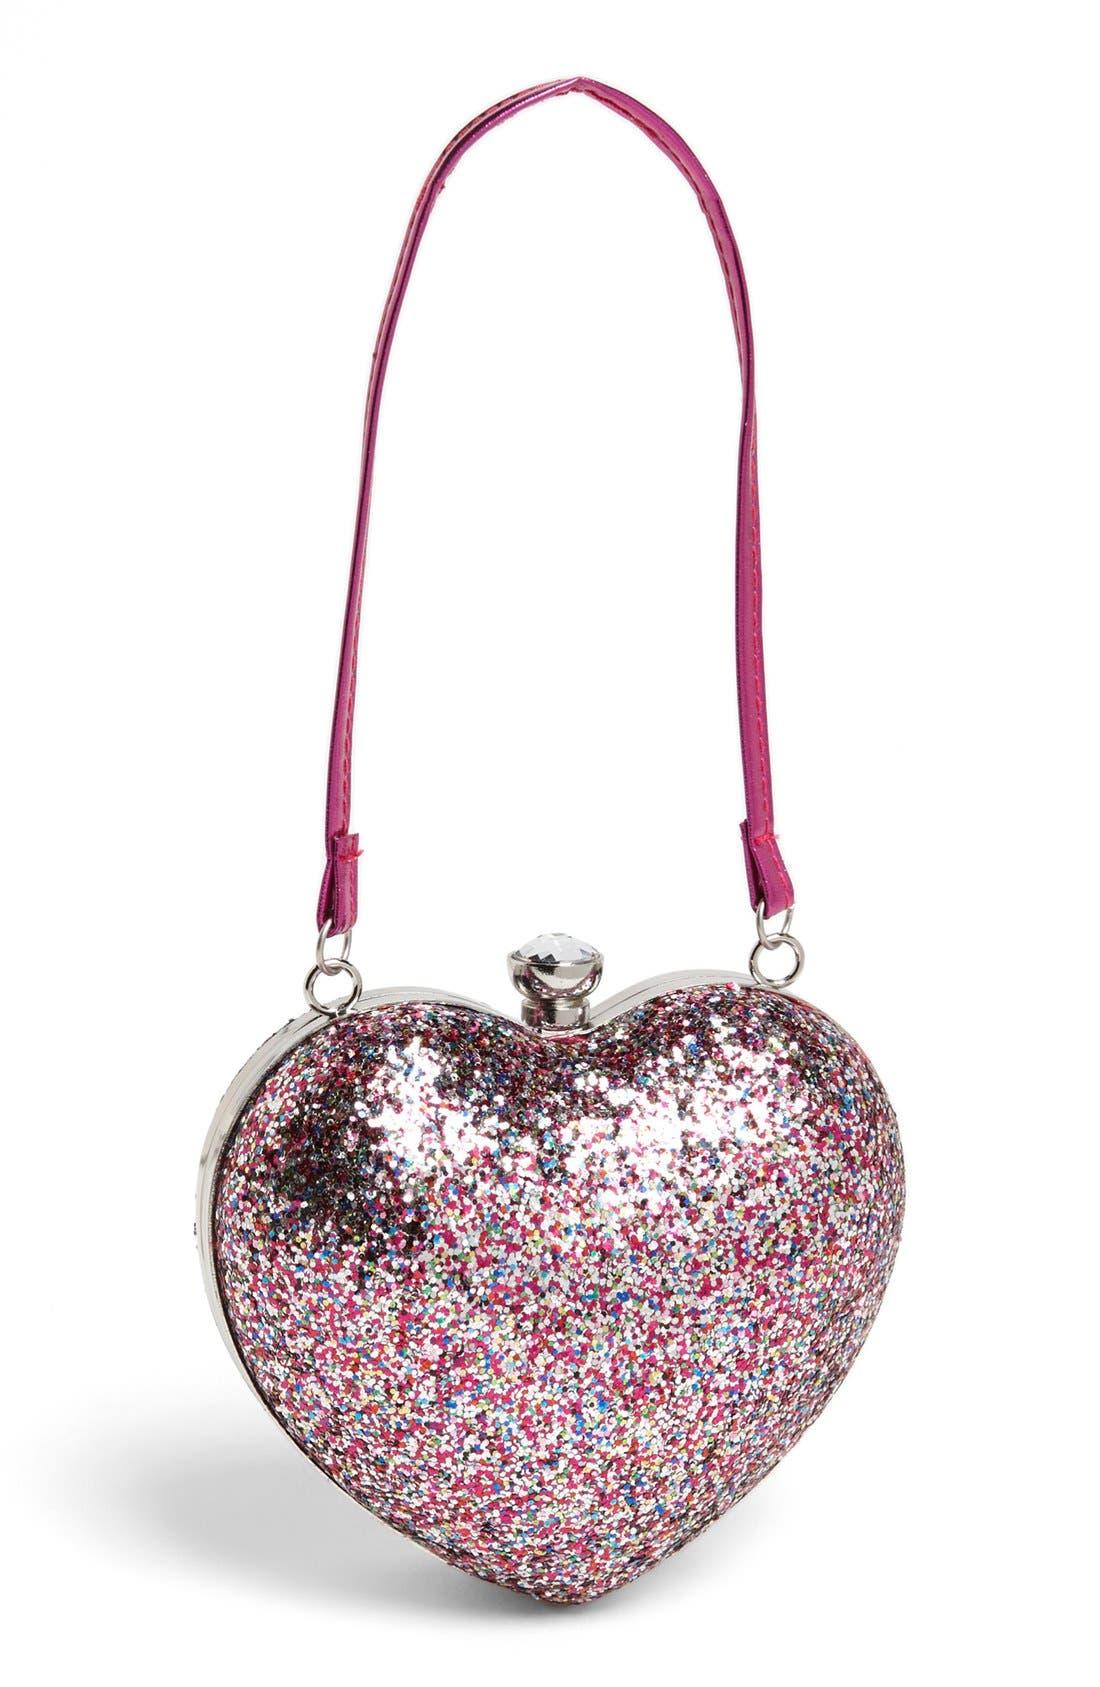 Main Image - Capelli of New York Glitter Heart Shaped Handbag (Girls)